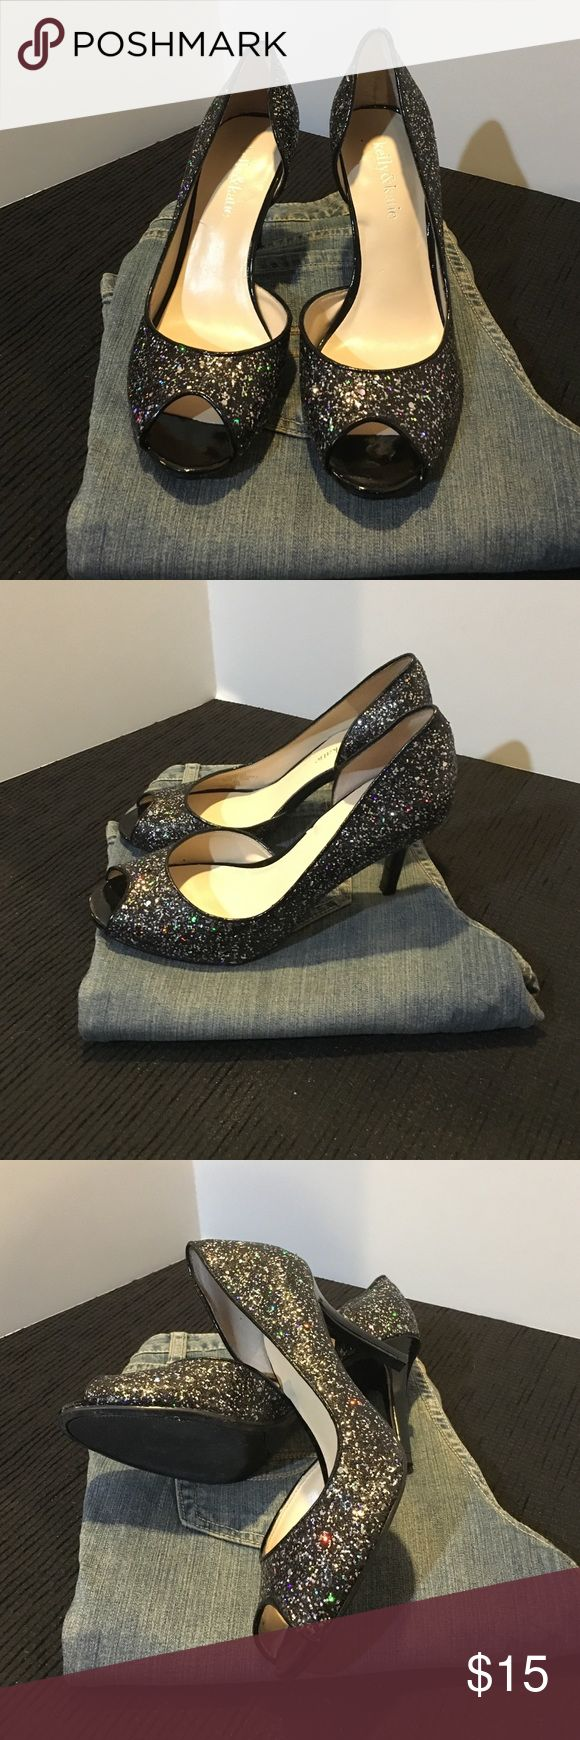 Black sandals 2 inch heel - Black With Sparkles 3 1 2 Inch Heel